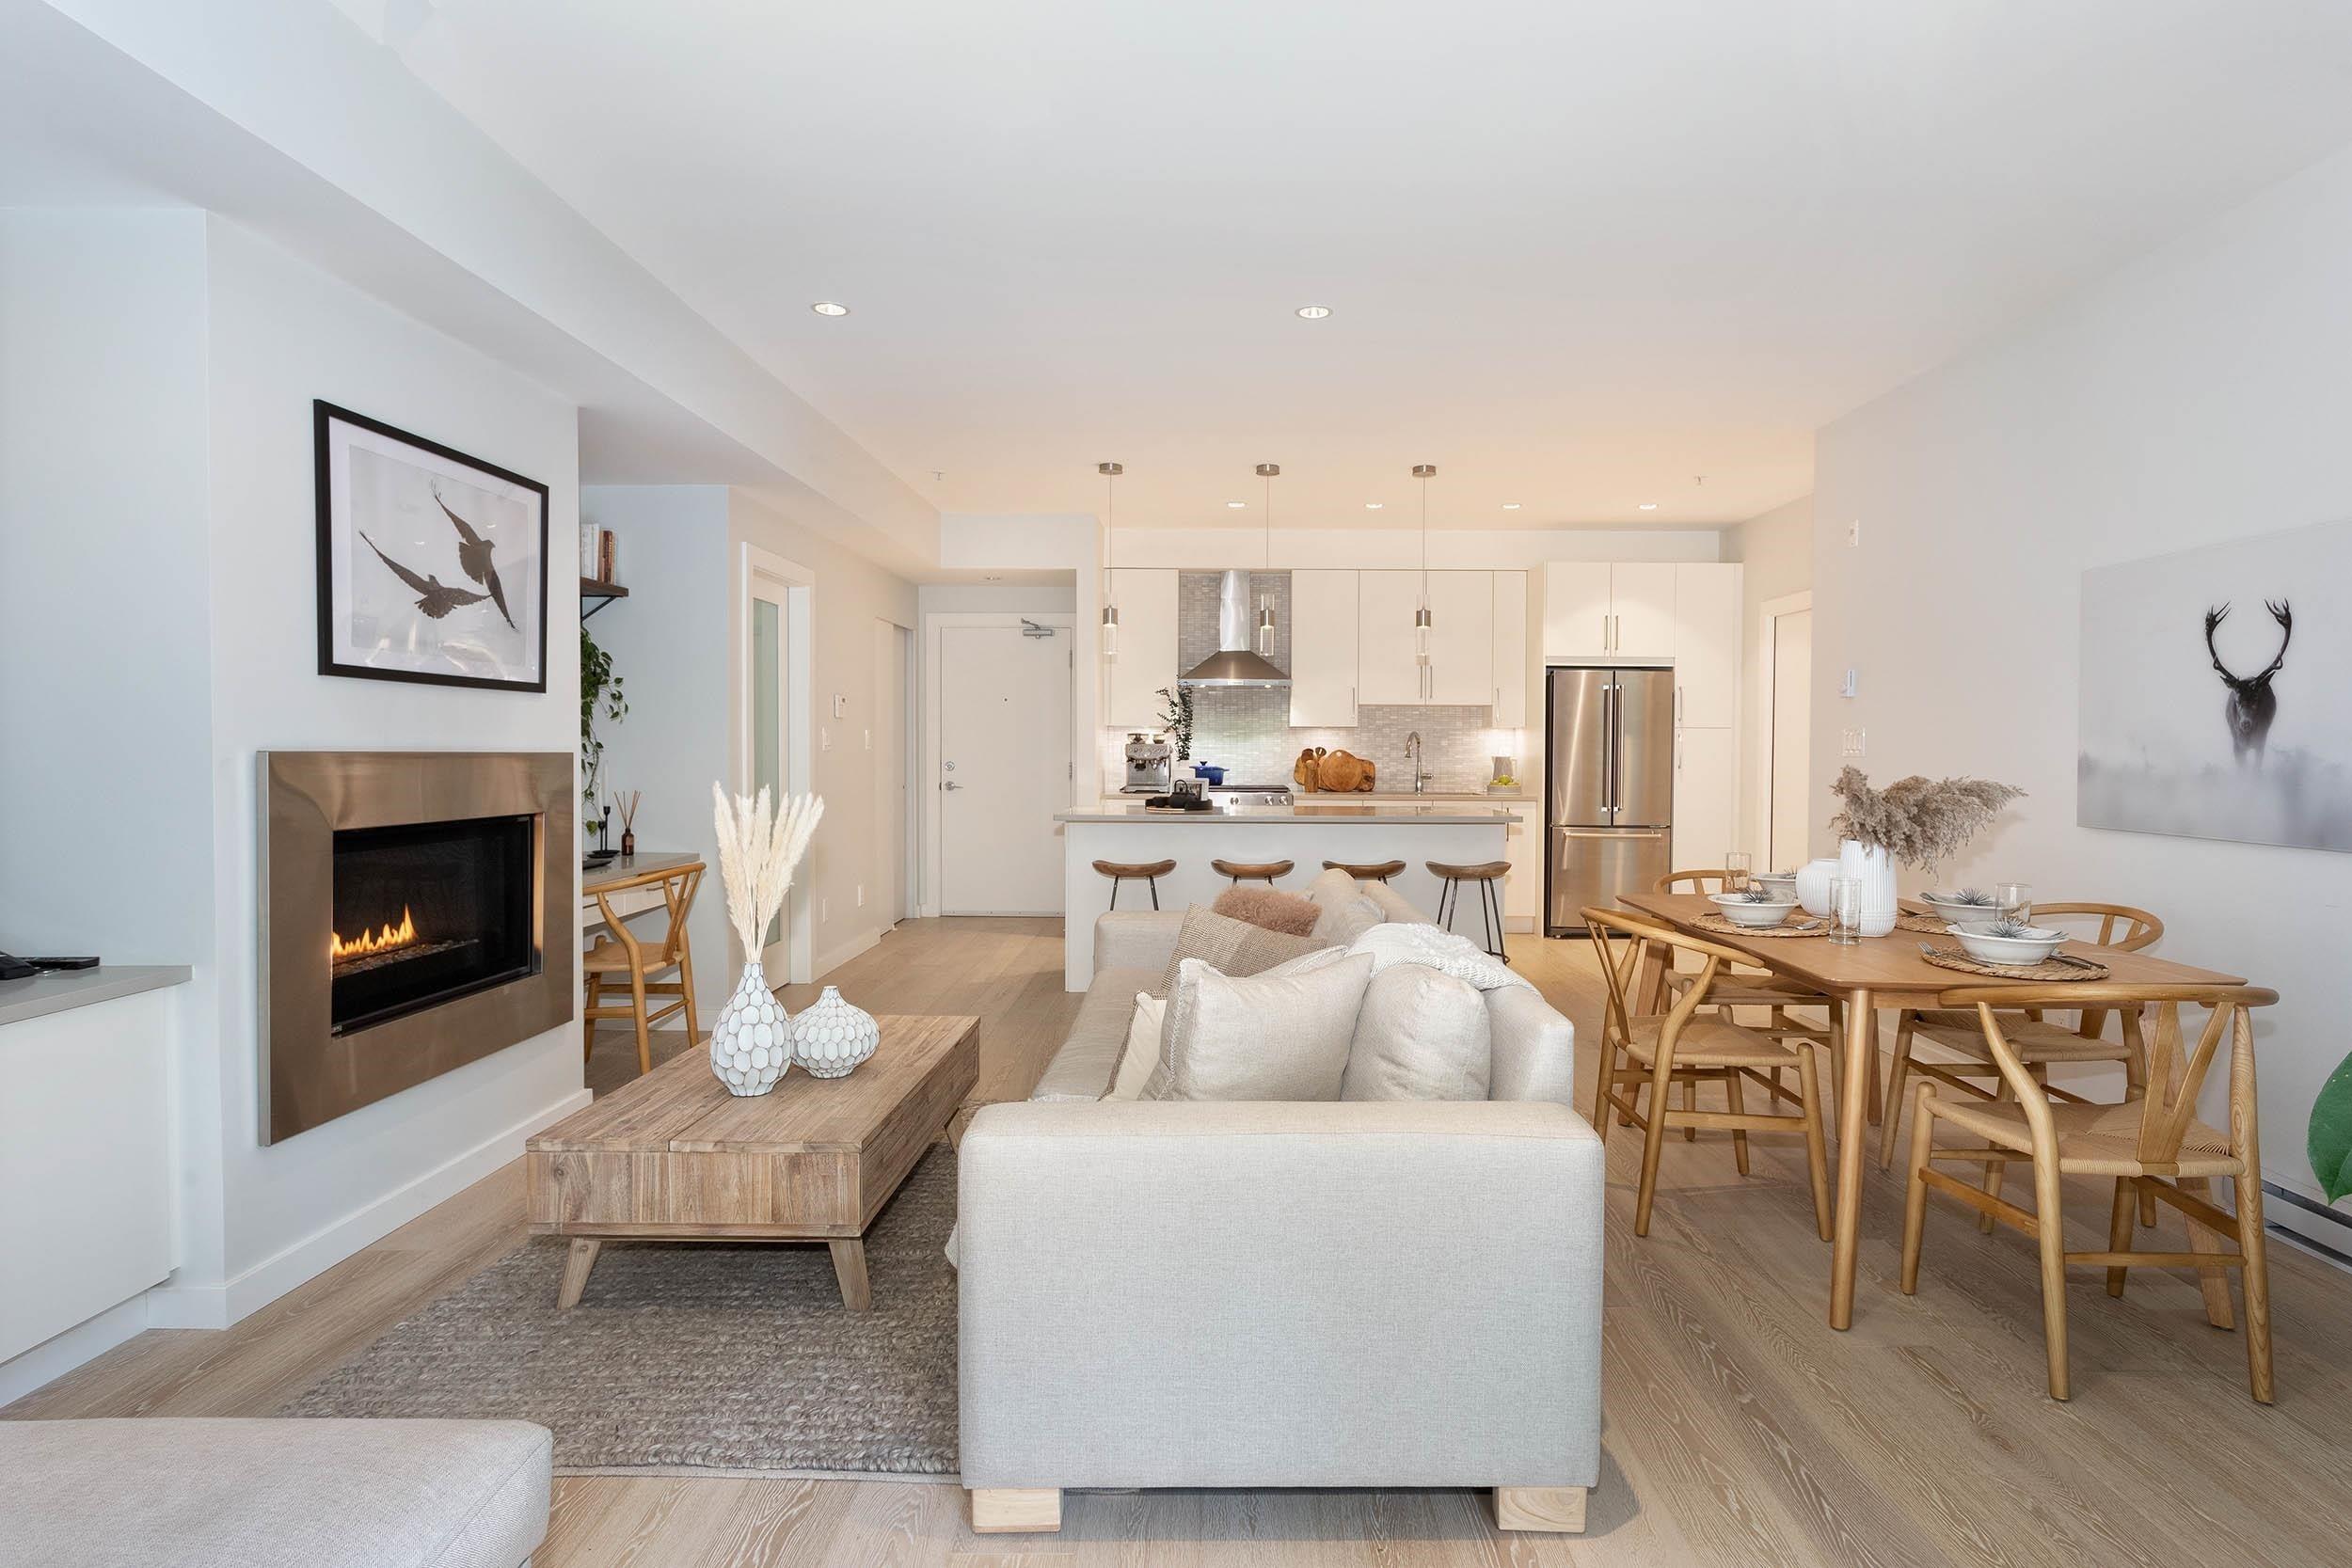 211 41328 SKYRIDGE PLACE - Garibaldi Highlands Apartment/Condo for sale, 3 Bedrooms (R2626534)